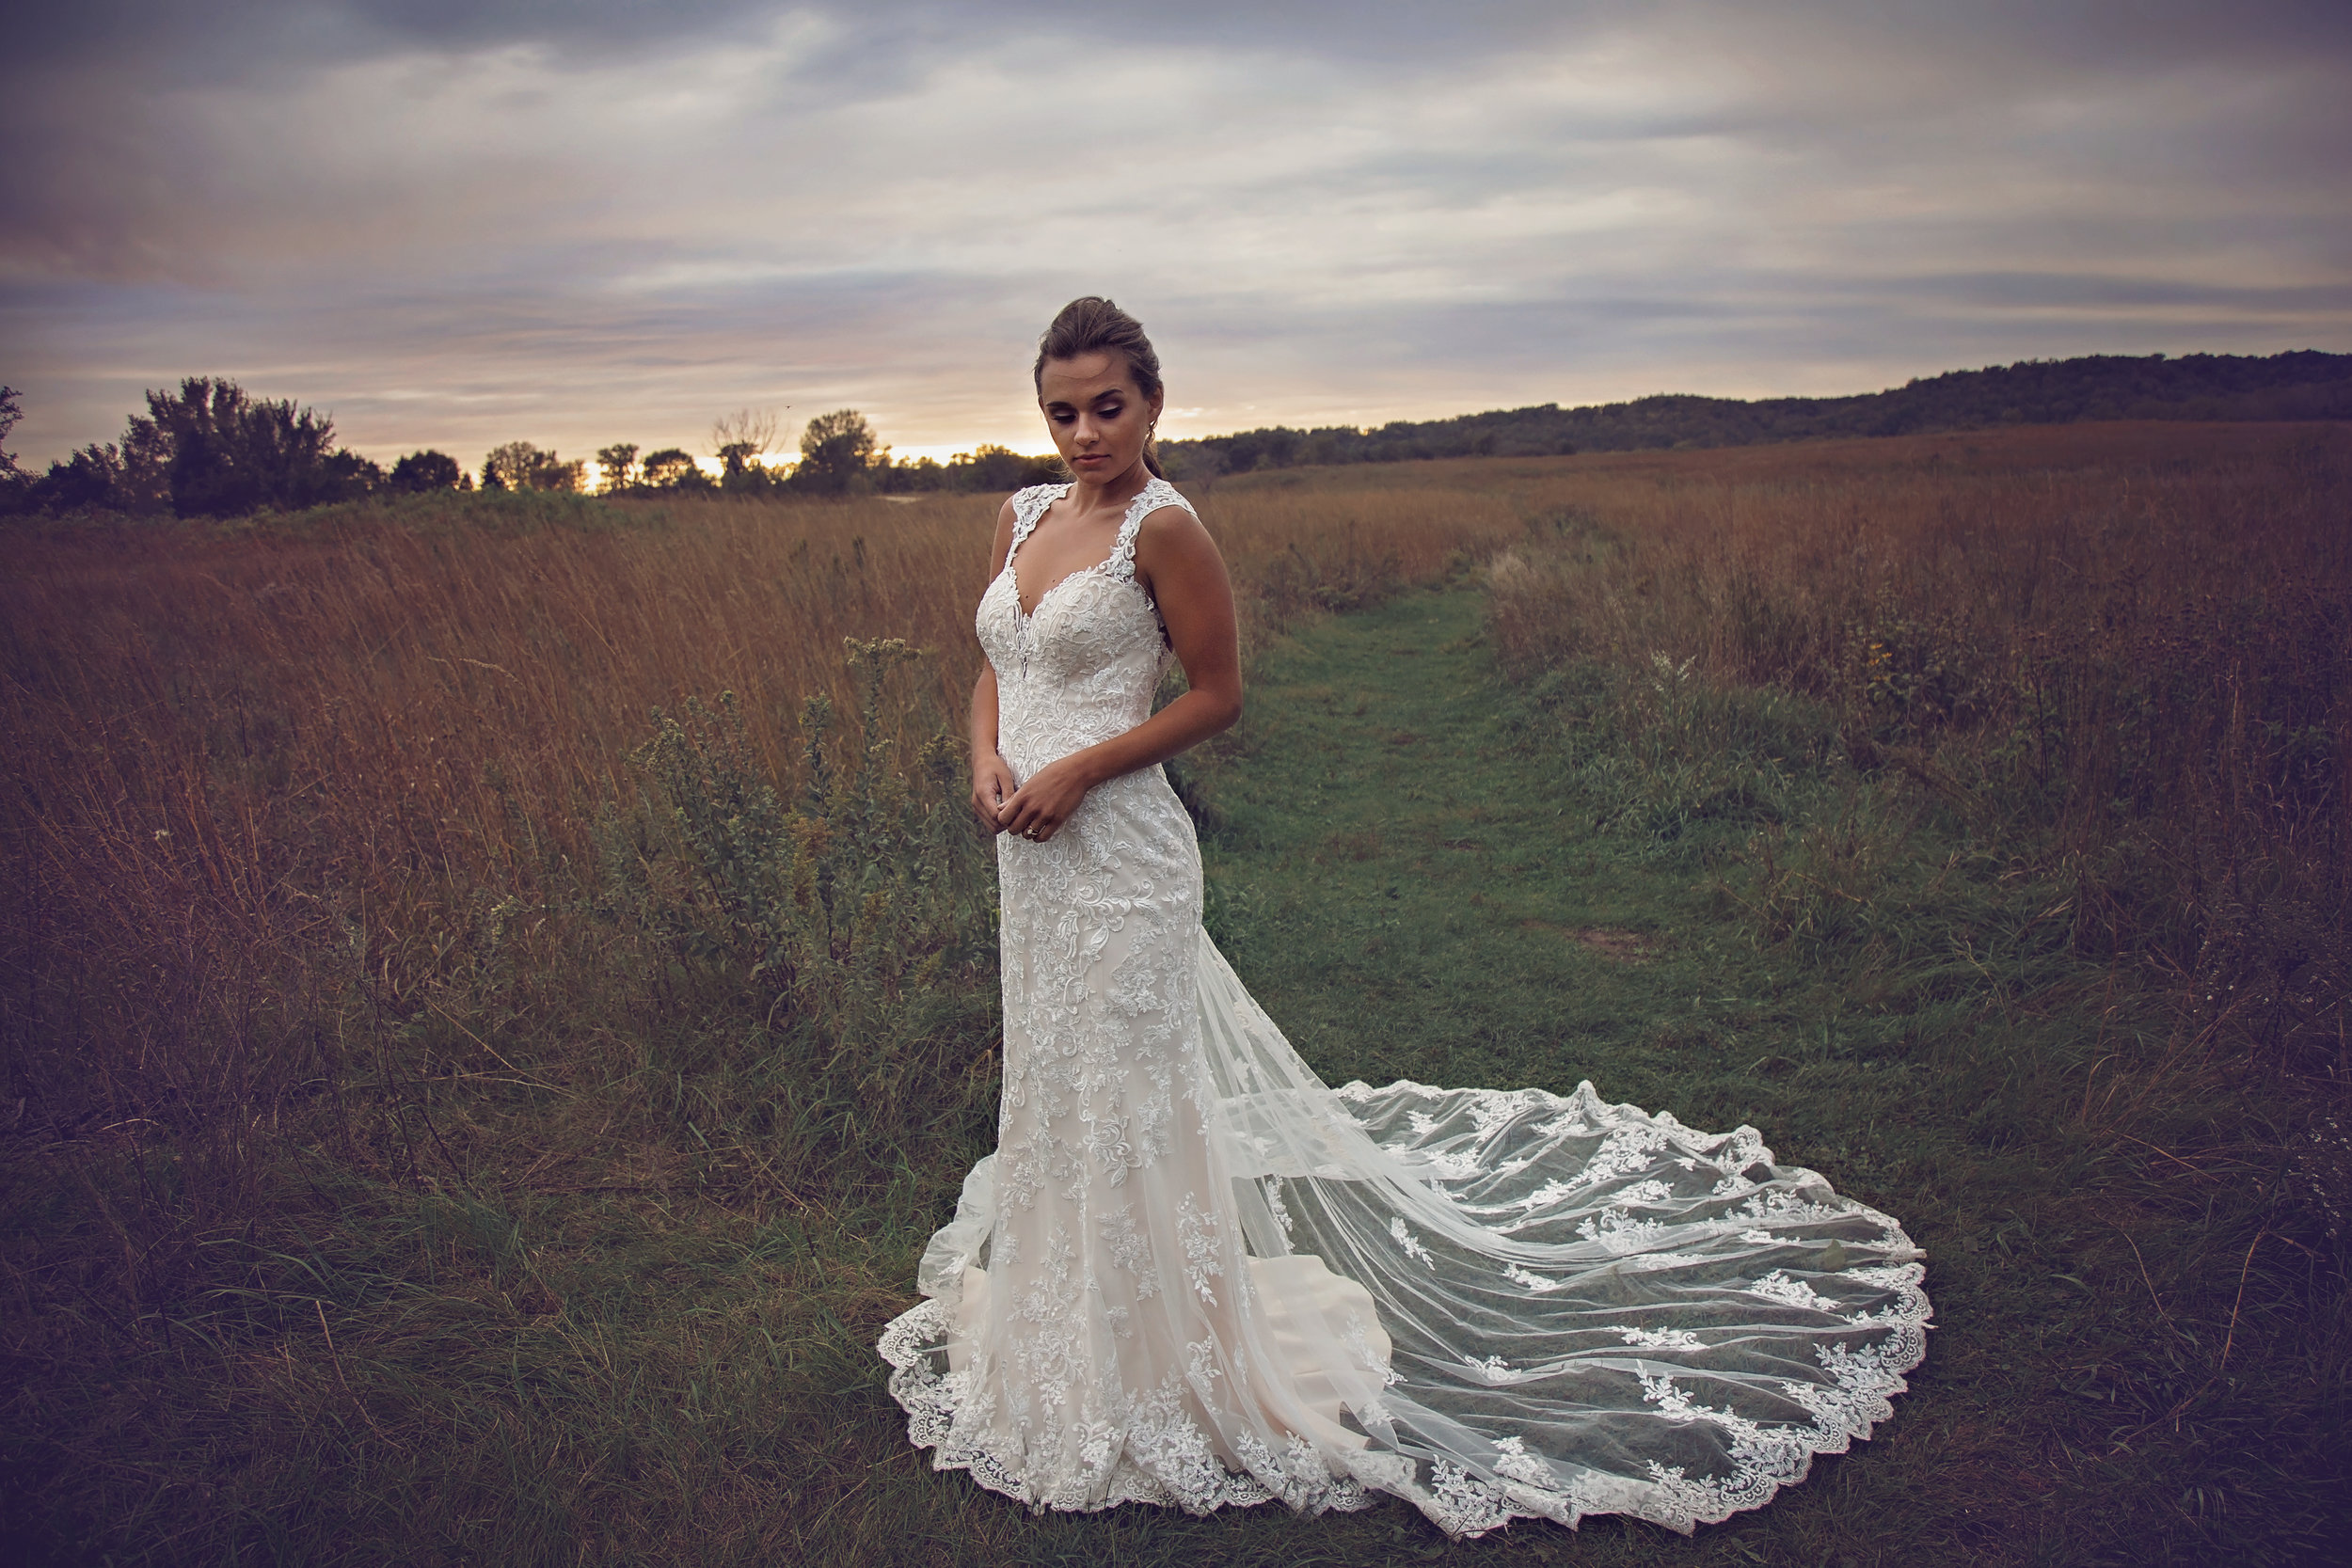 MINNESOTA WEDDING PHOTOGRAPHER   PAMELA HERNANDEZ BEAUTY     INSPIRE BRIDAL BOUTIQUE   INTUITION WEDDINGS BY ID PHOTOGRAPHY